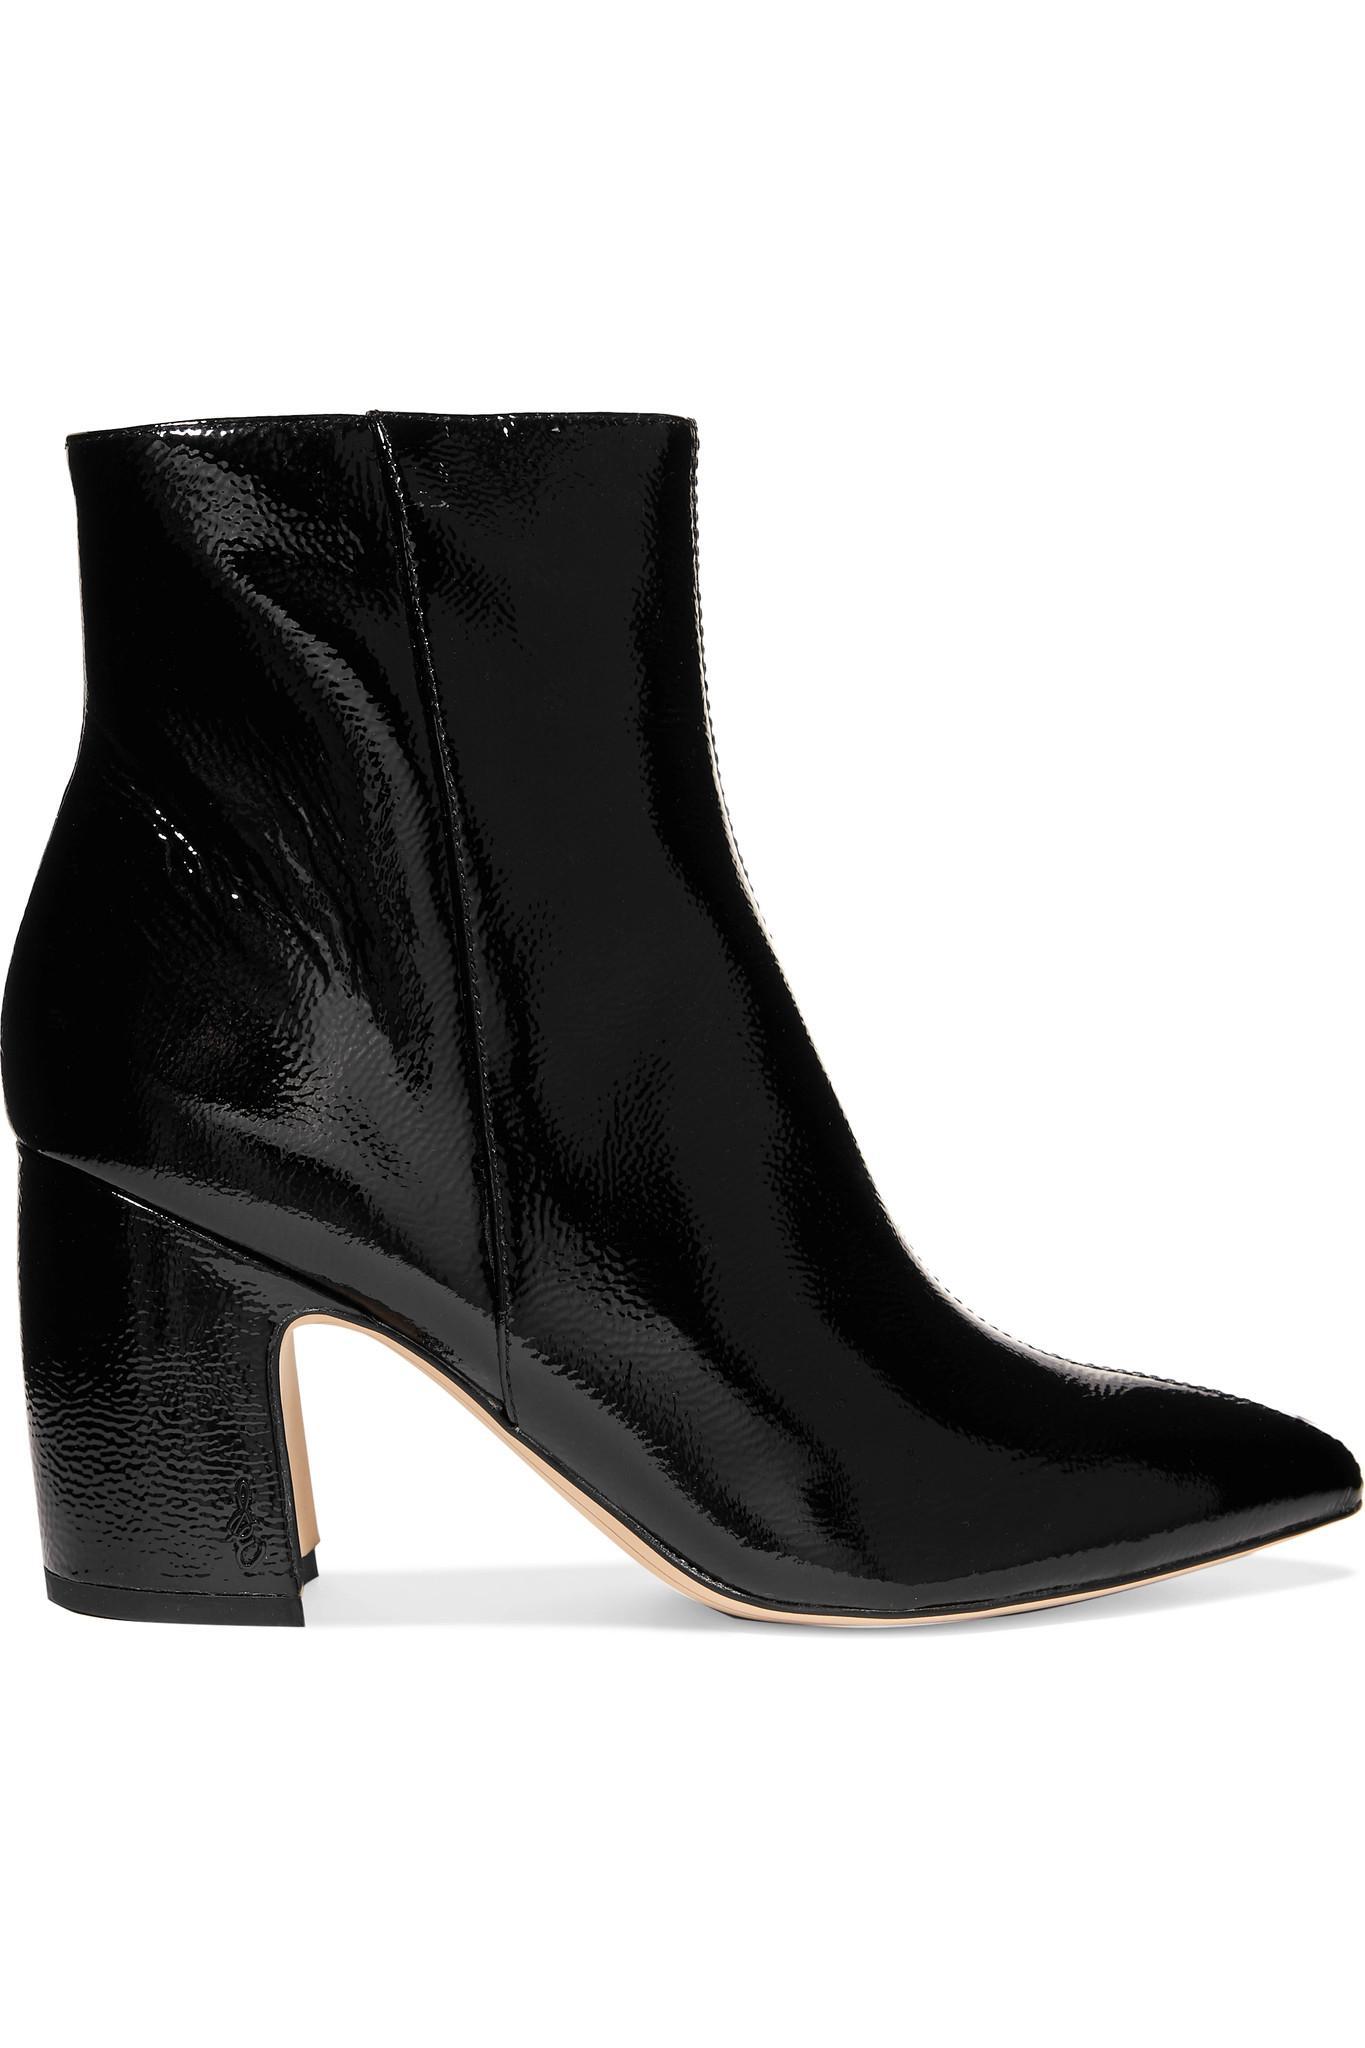 d7d4e97e2553 Sam Edelman Hilty Patent-leather Ankle Boots in Black - Lyst